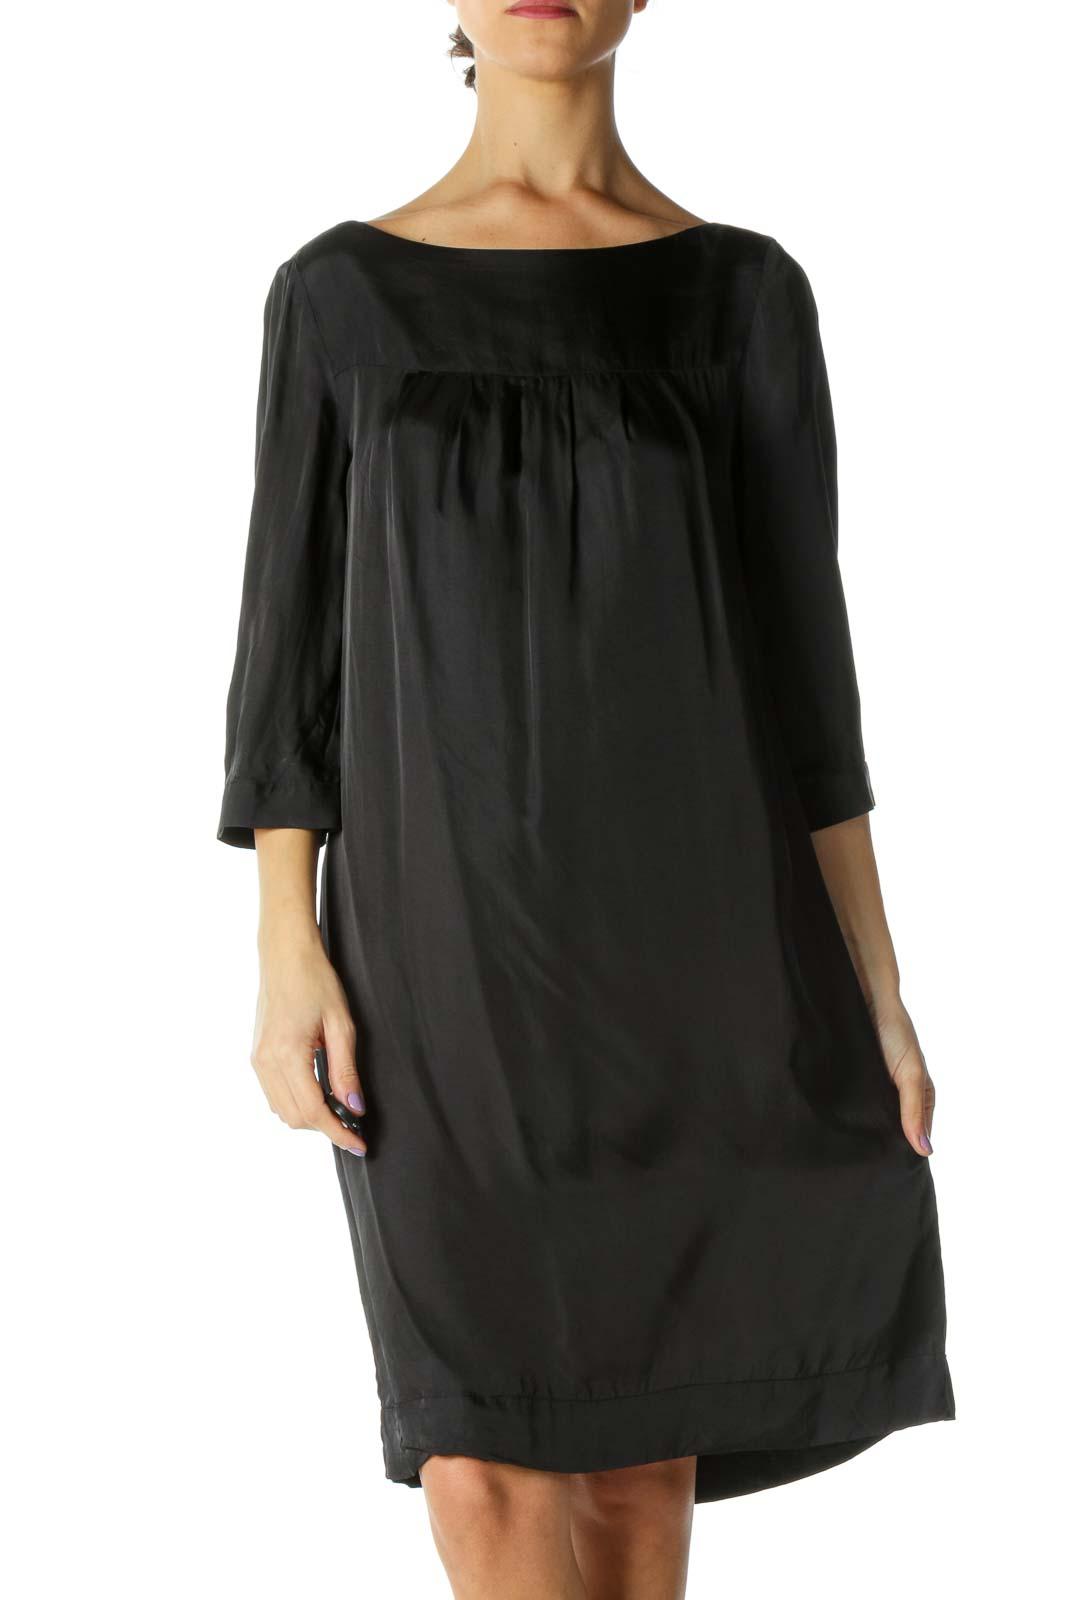 Black Round Neck Shift Dress Front